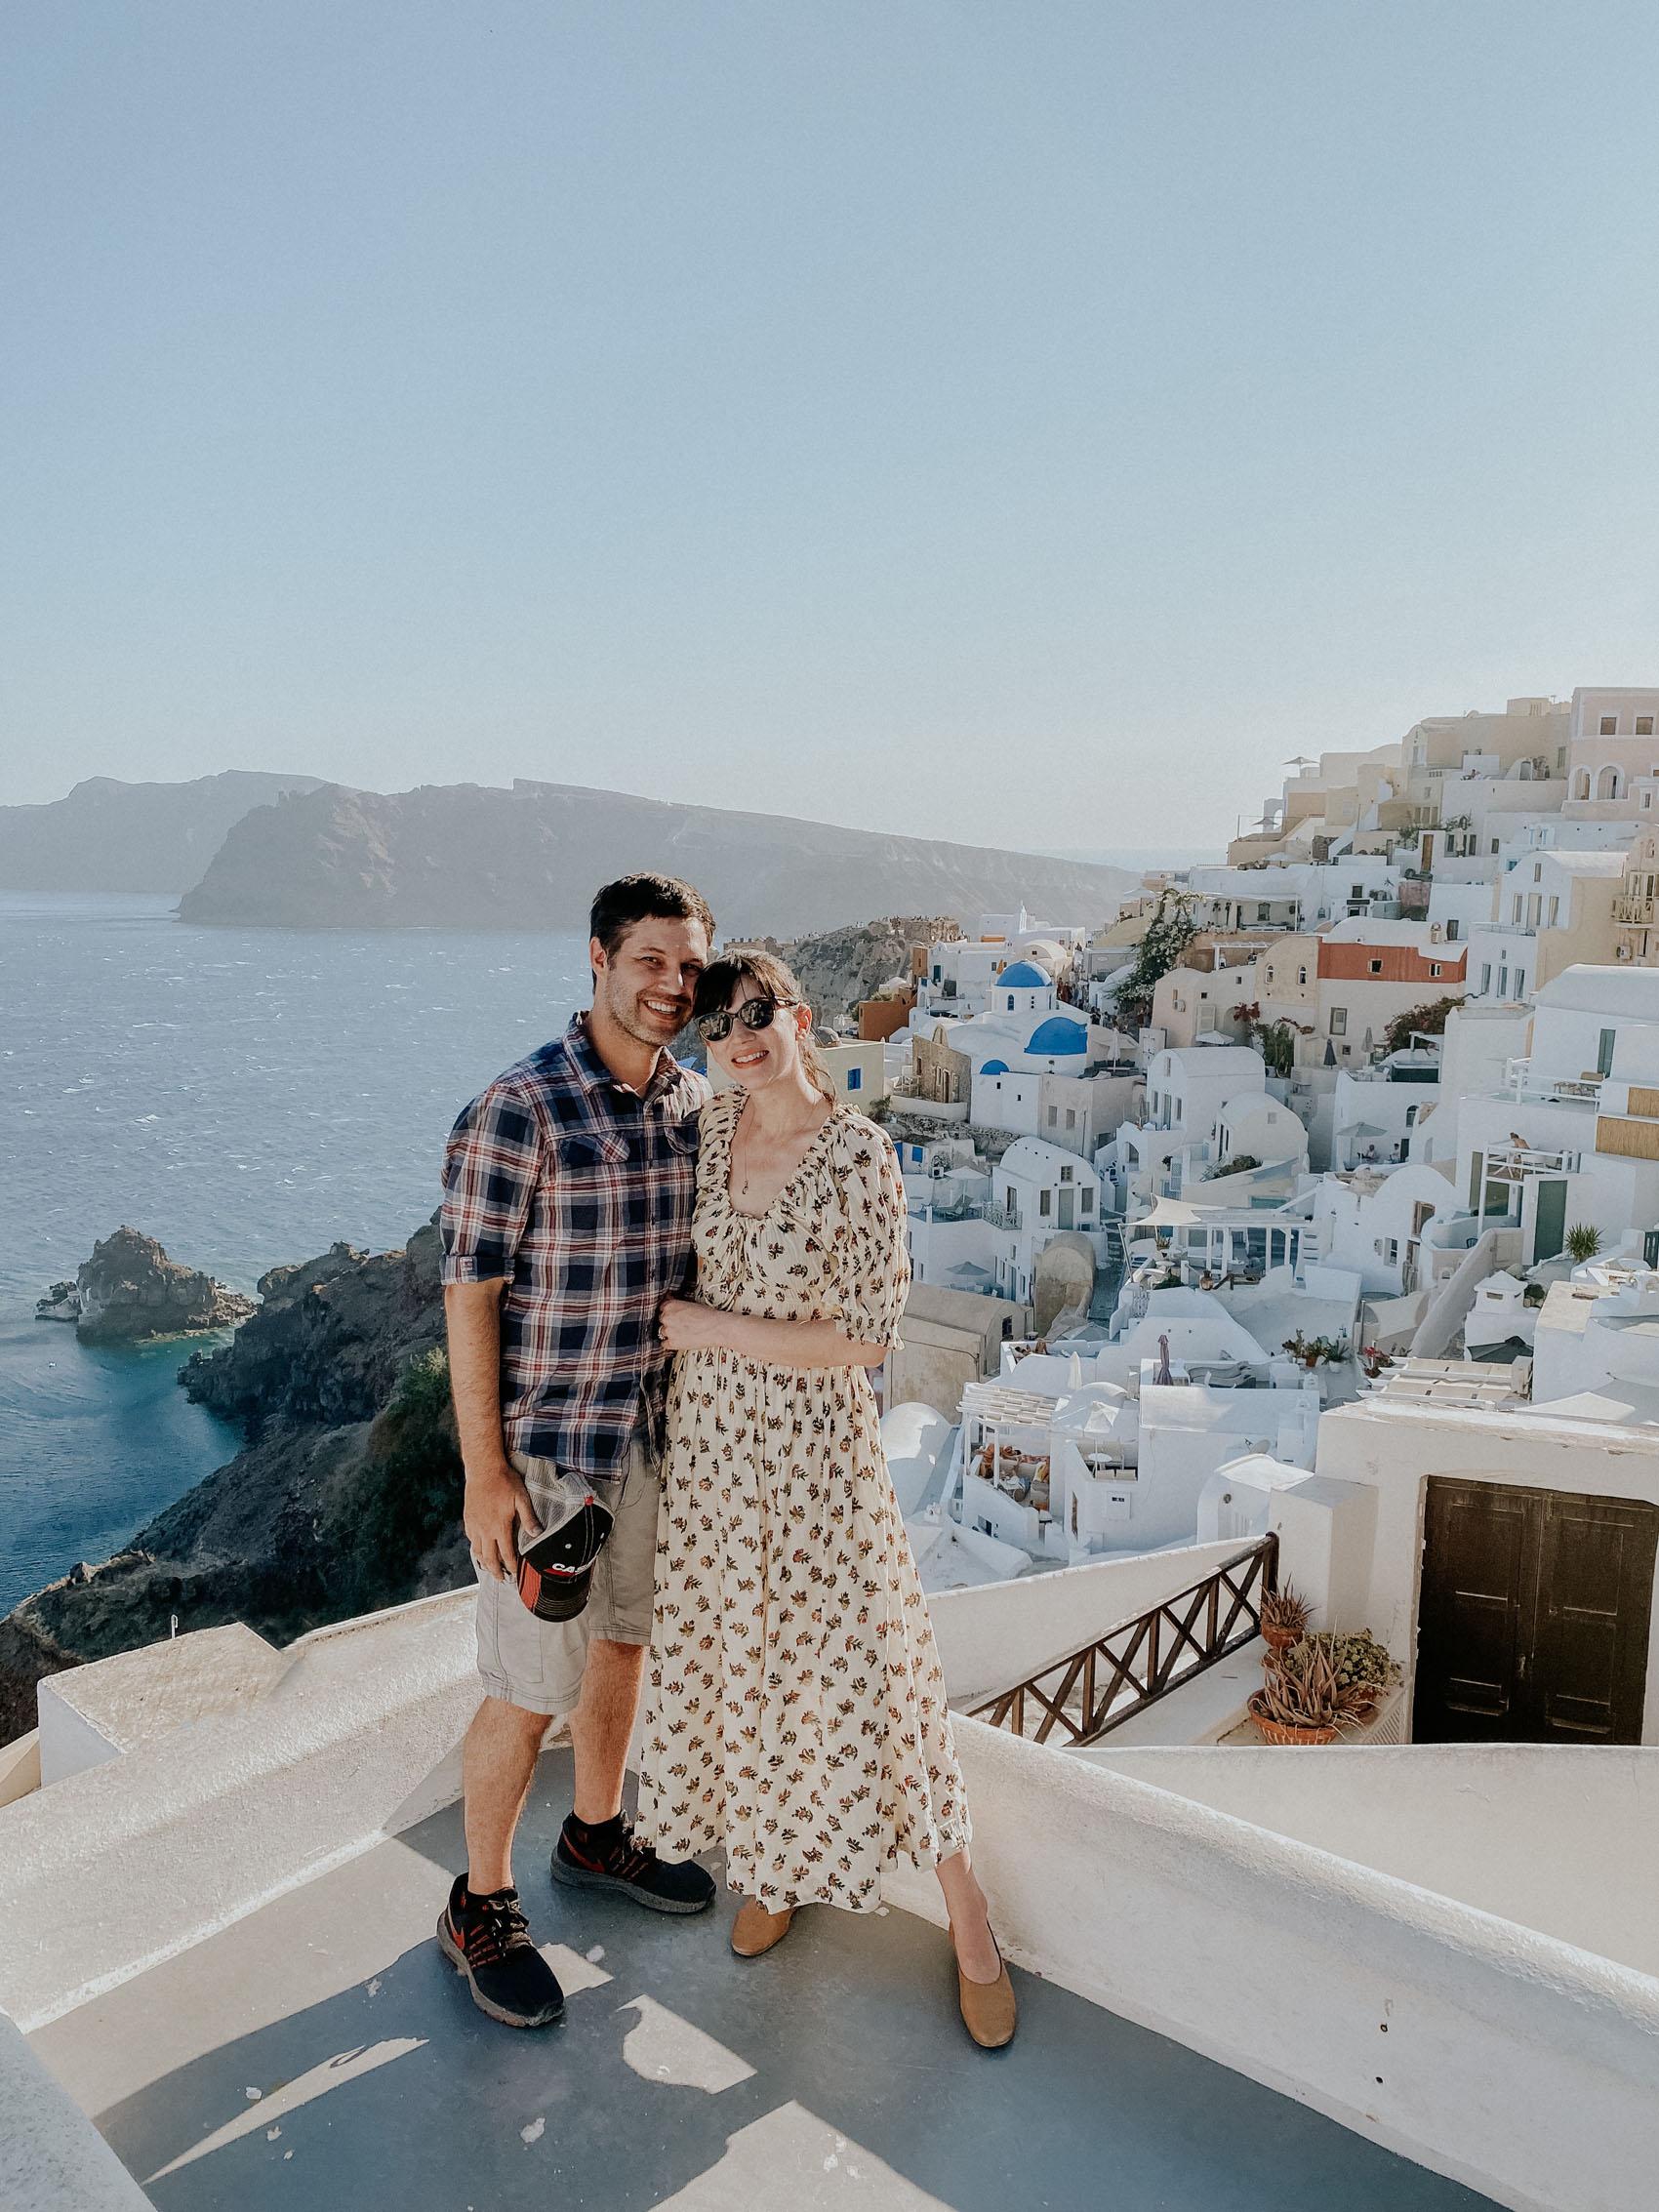 Santorini Travel Guide: A couple at photo spot in Oia Santorini